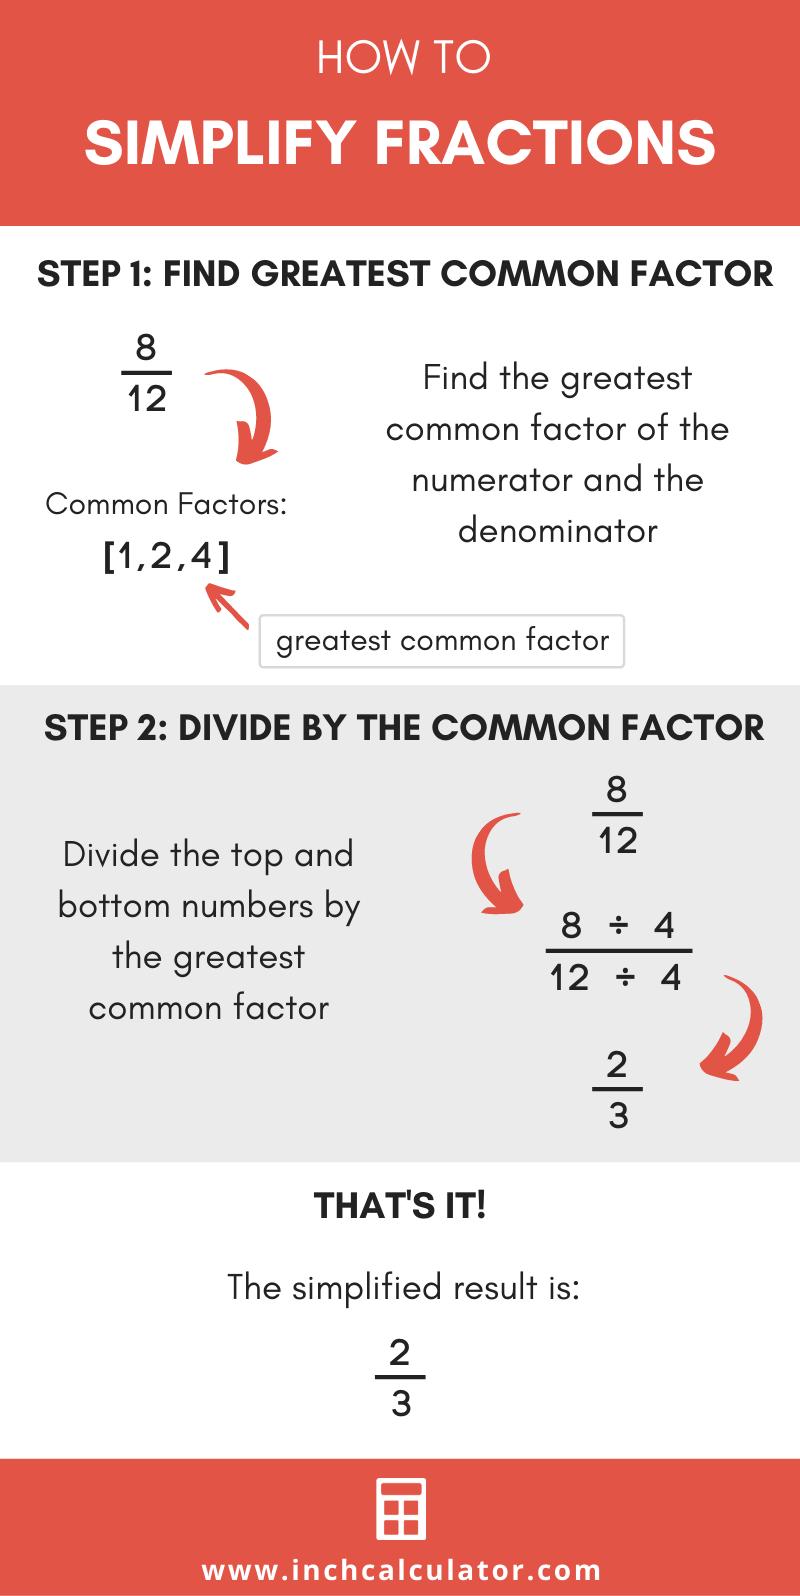 Share fraction simplifier – simplify fraction calculator